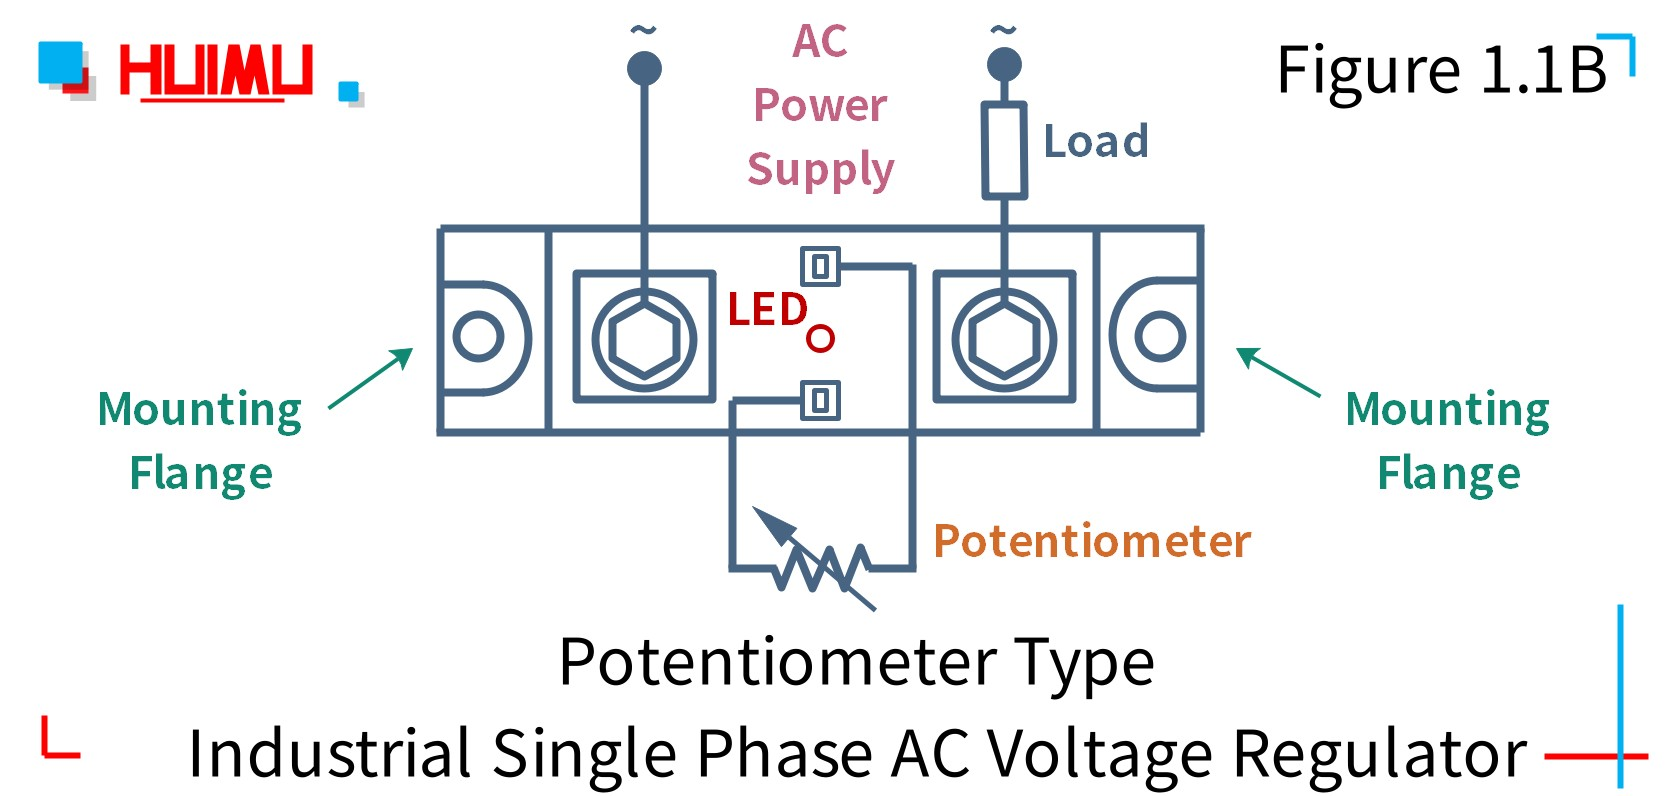 How to wire MGR mager MGR-HVR120A, MGR-HVR200A potentiometer type single phase AC voltage regulator? More detail via www.@huimultd.com